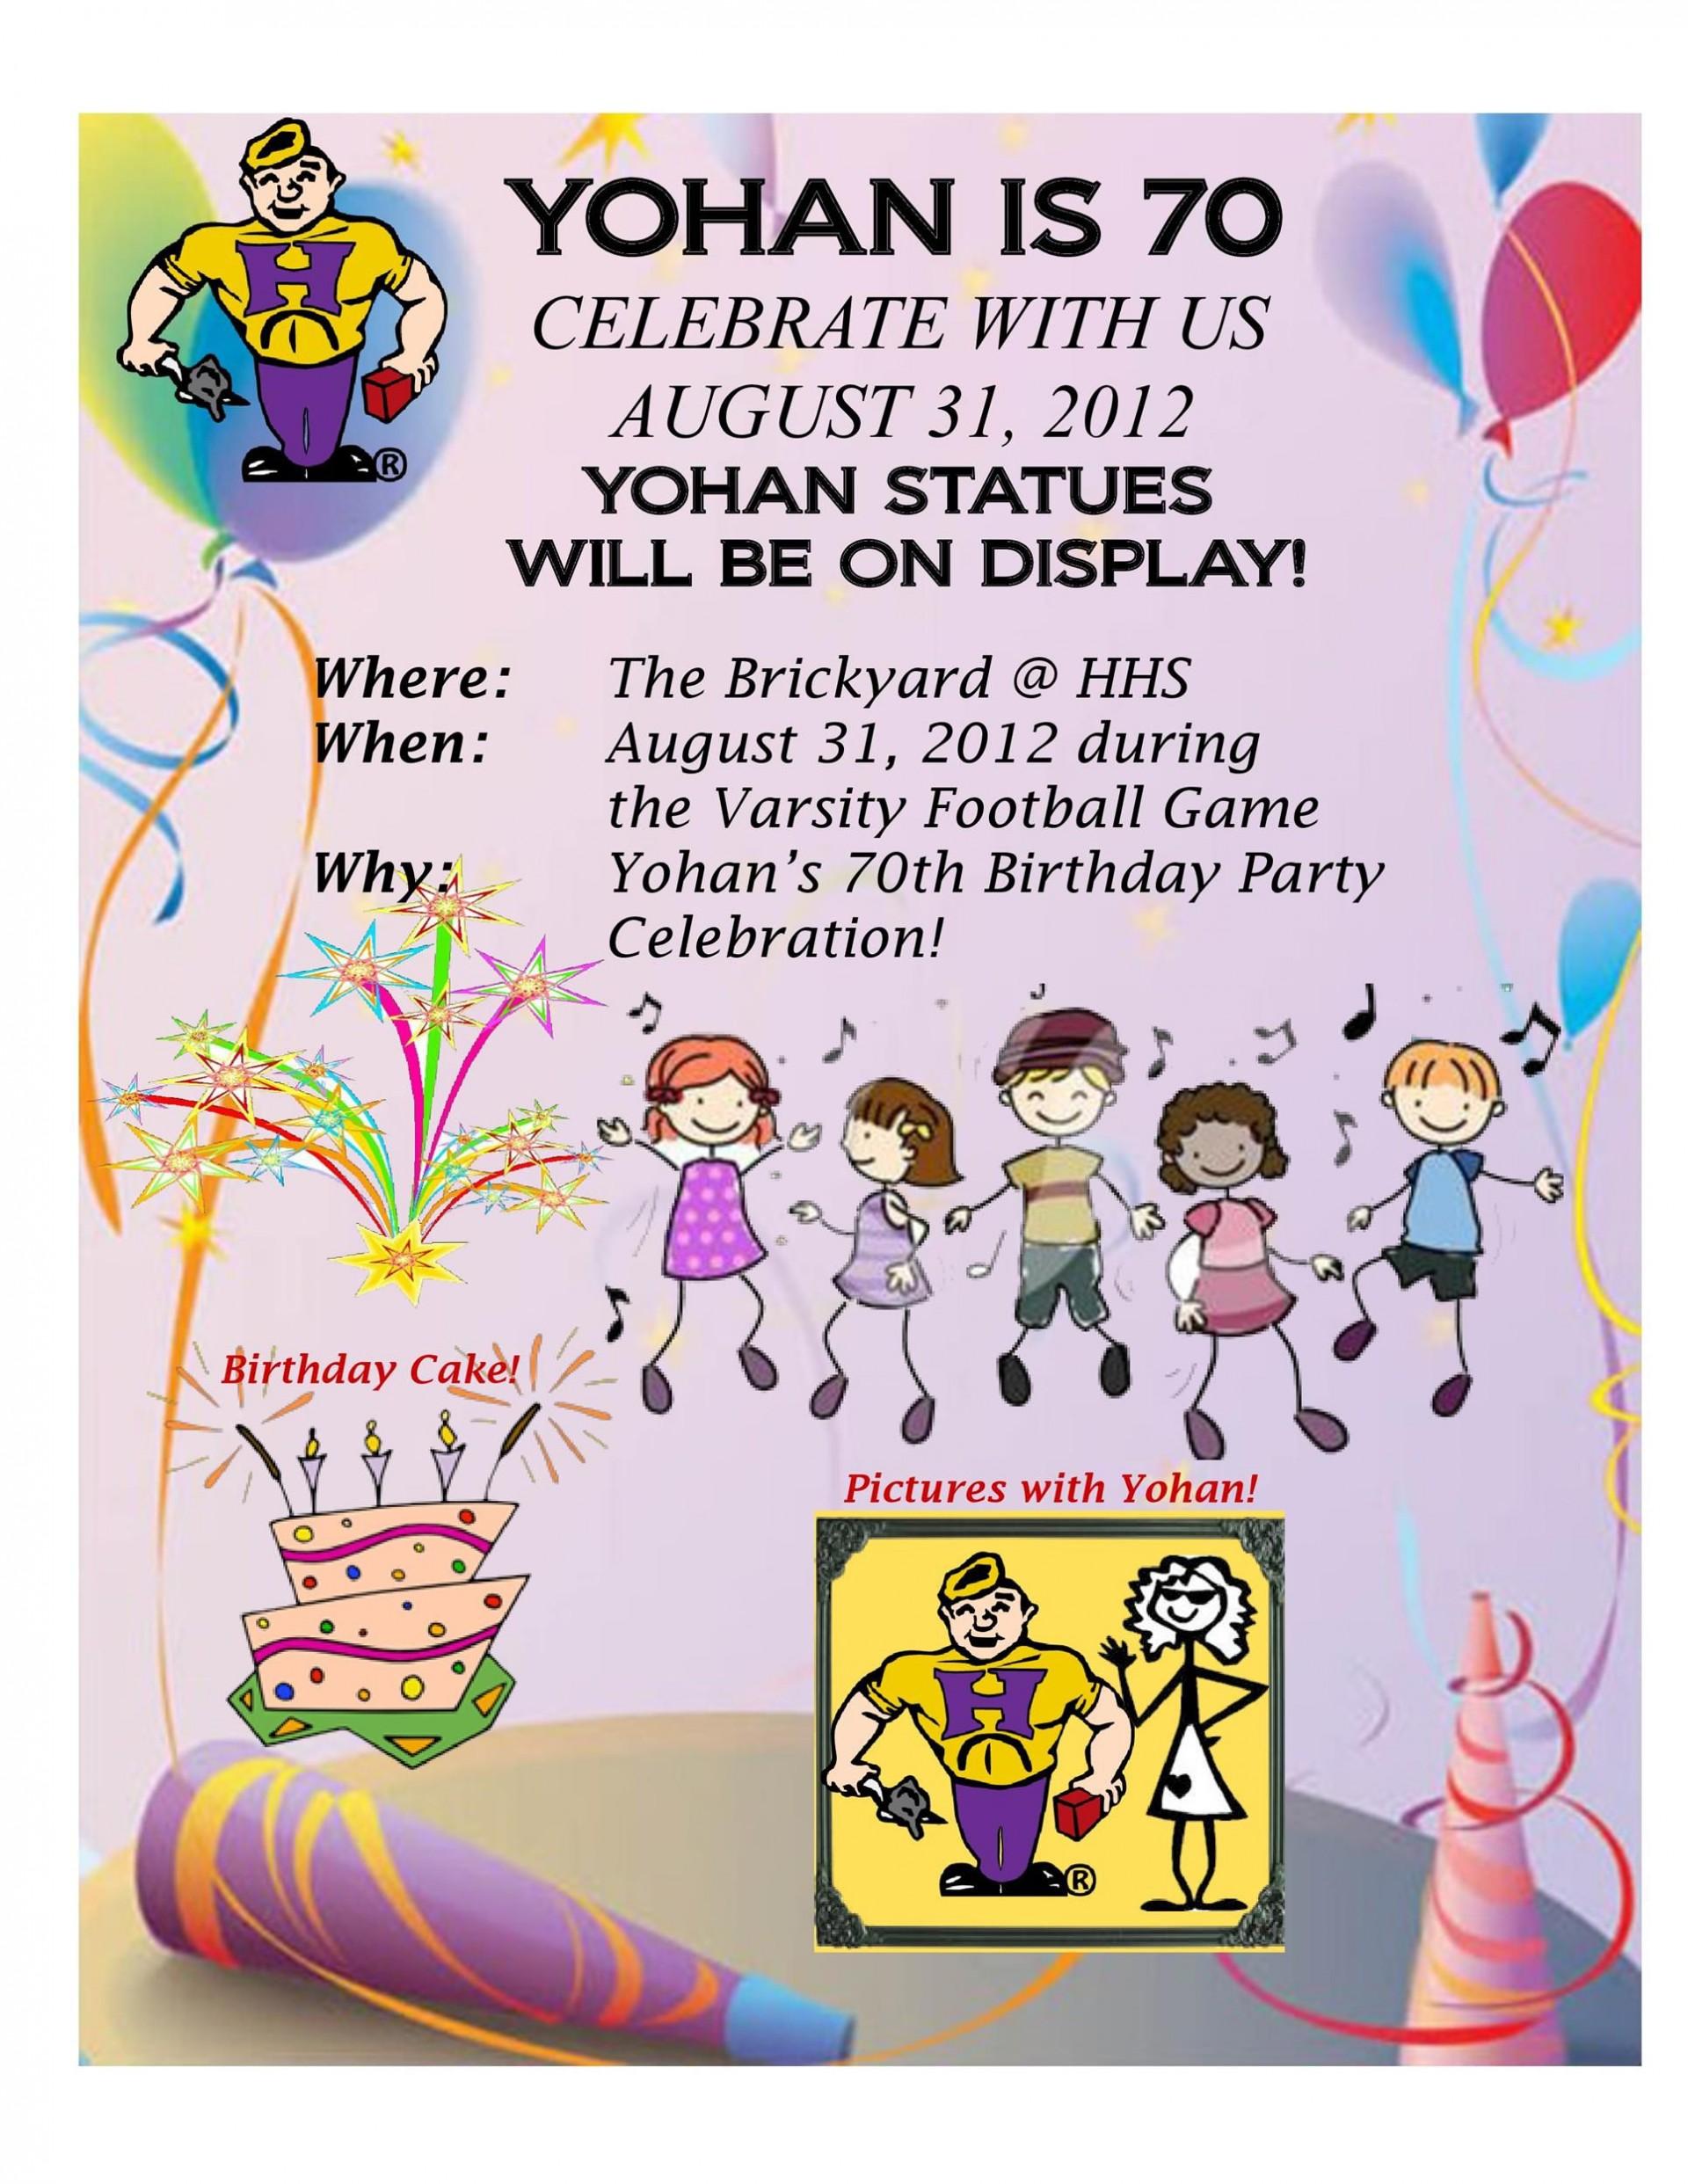 007 Unusual Free Christma Party Invitation Template Uk Inspiration 1920